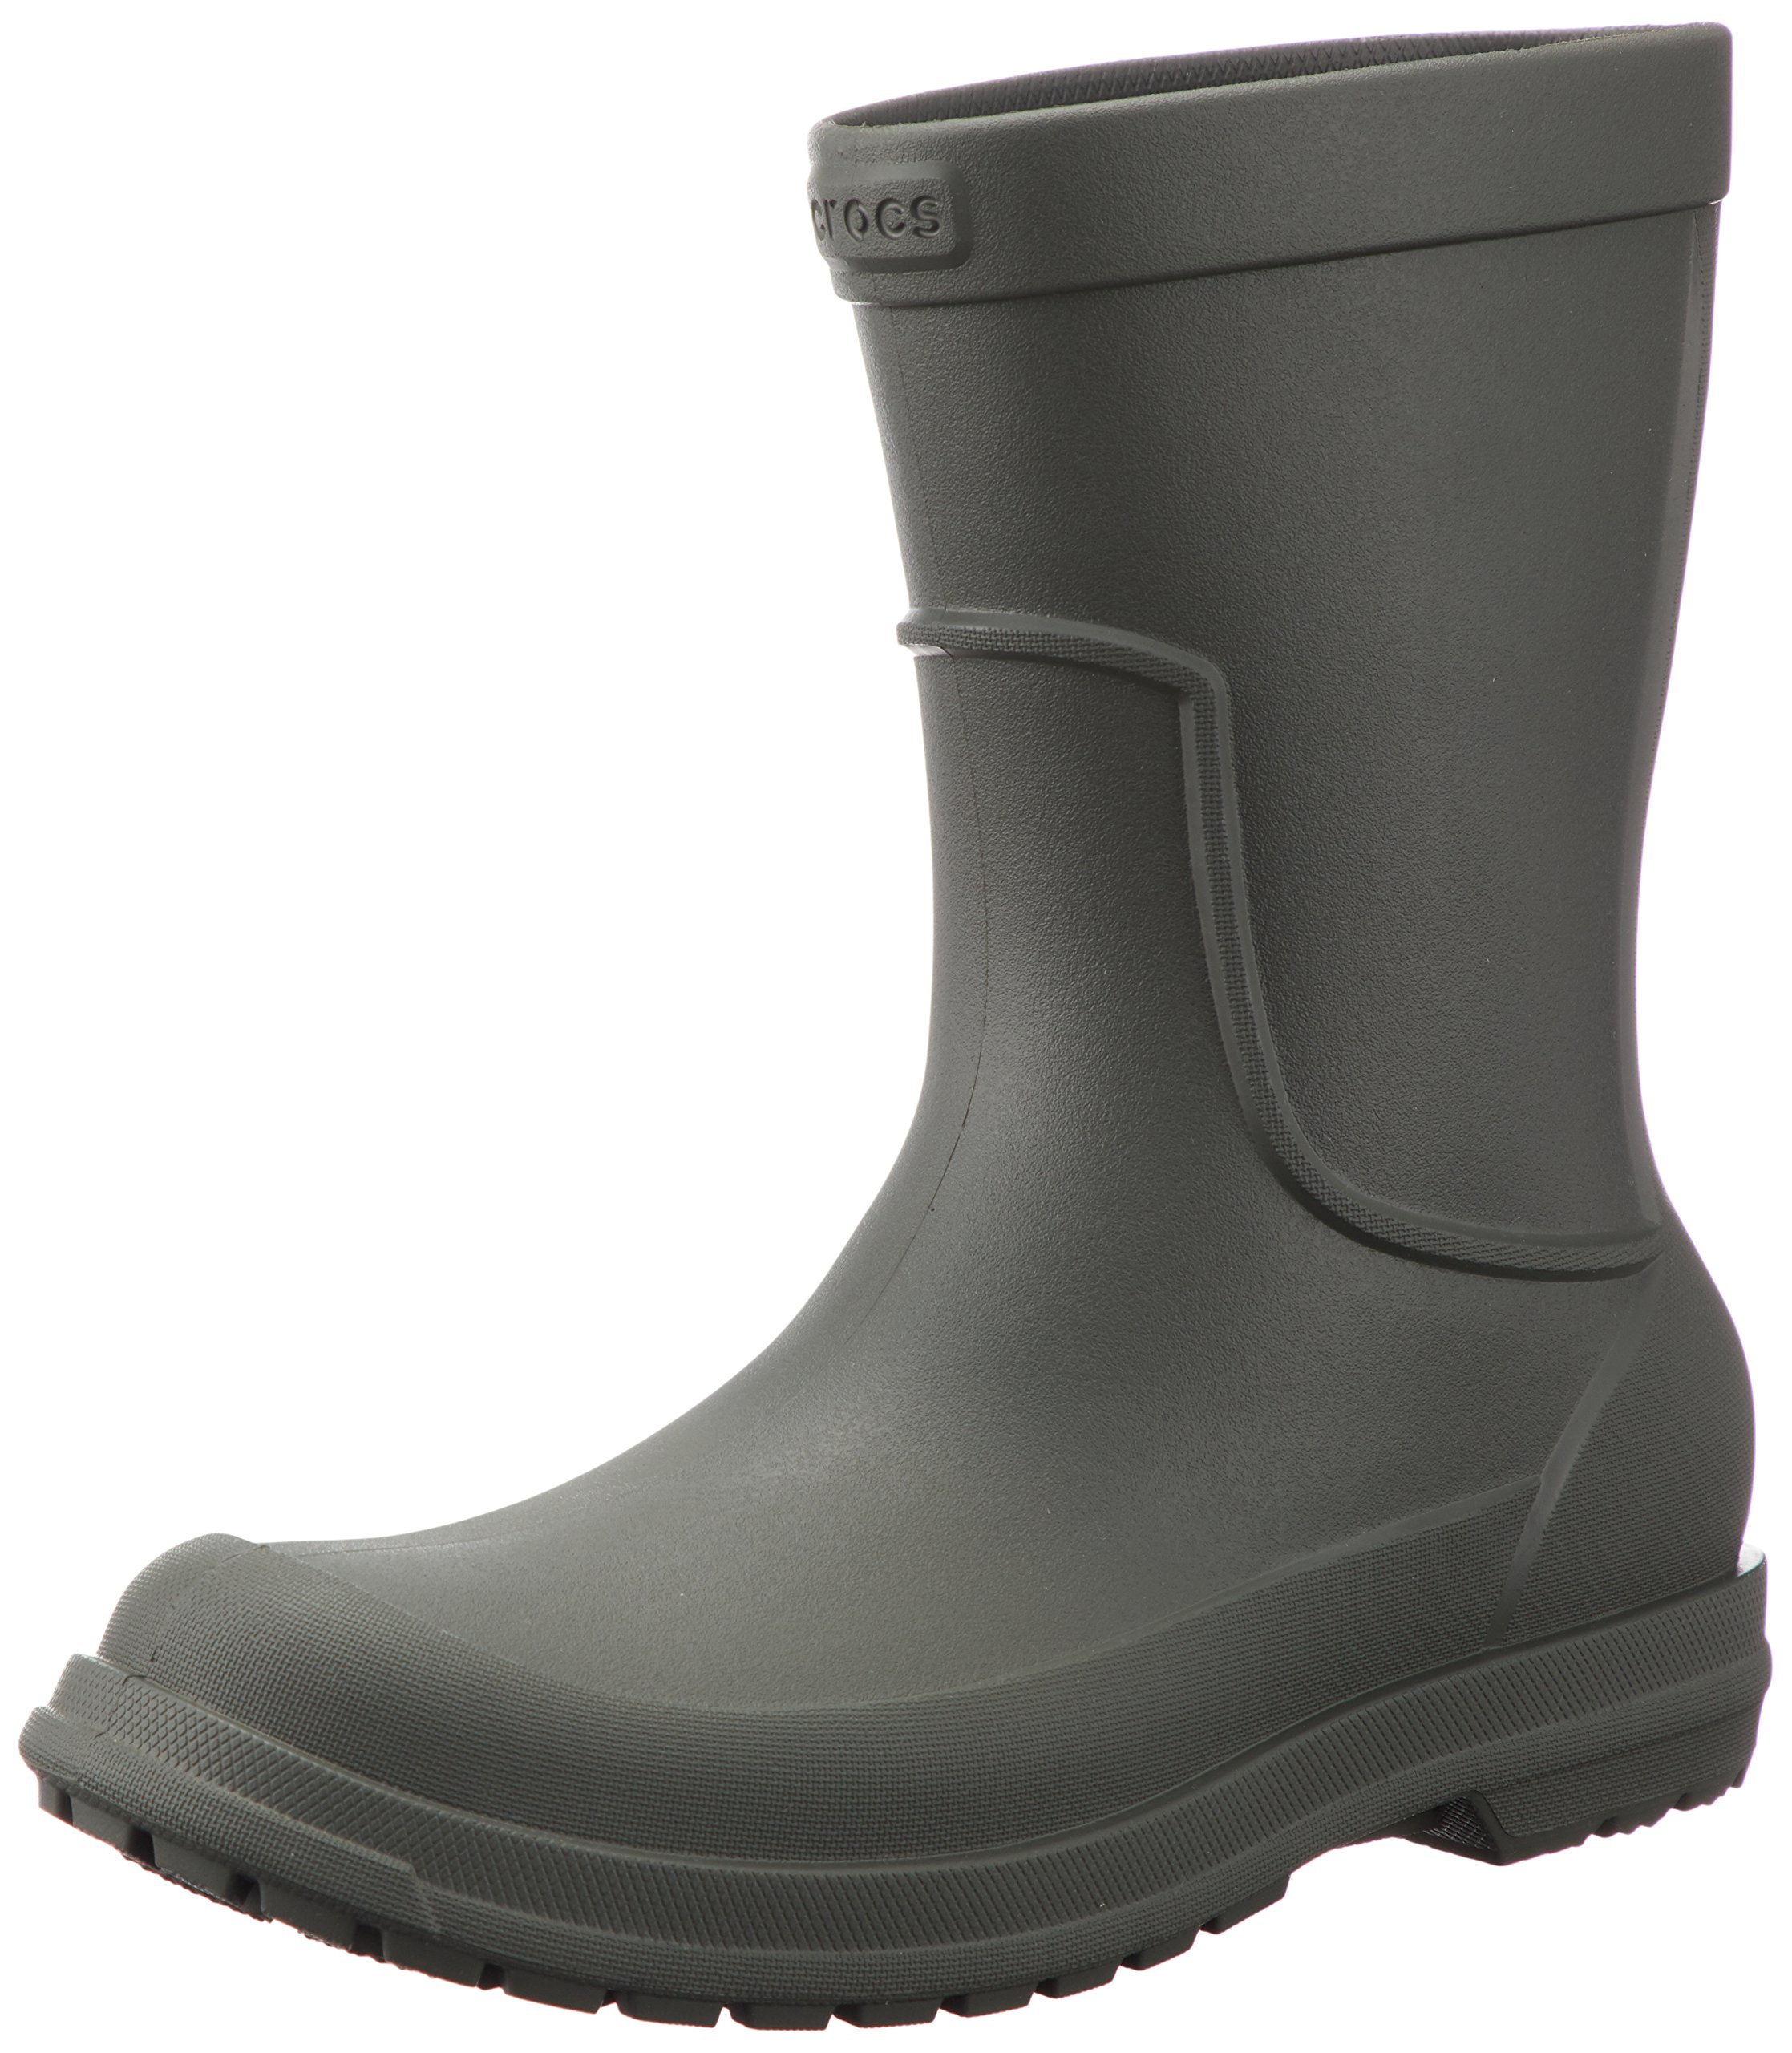 Crocs Men's AllCast M Rain Boot, Dusty Olive/Dusty Olive, 13 M US